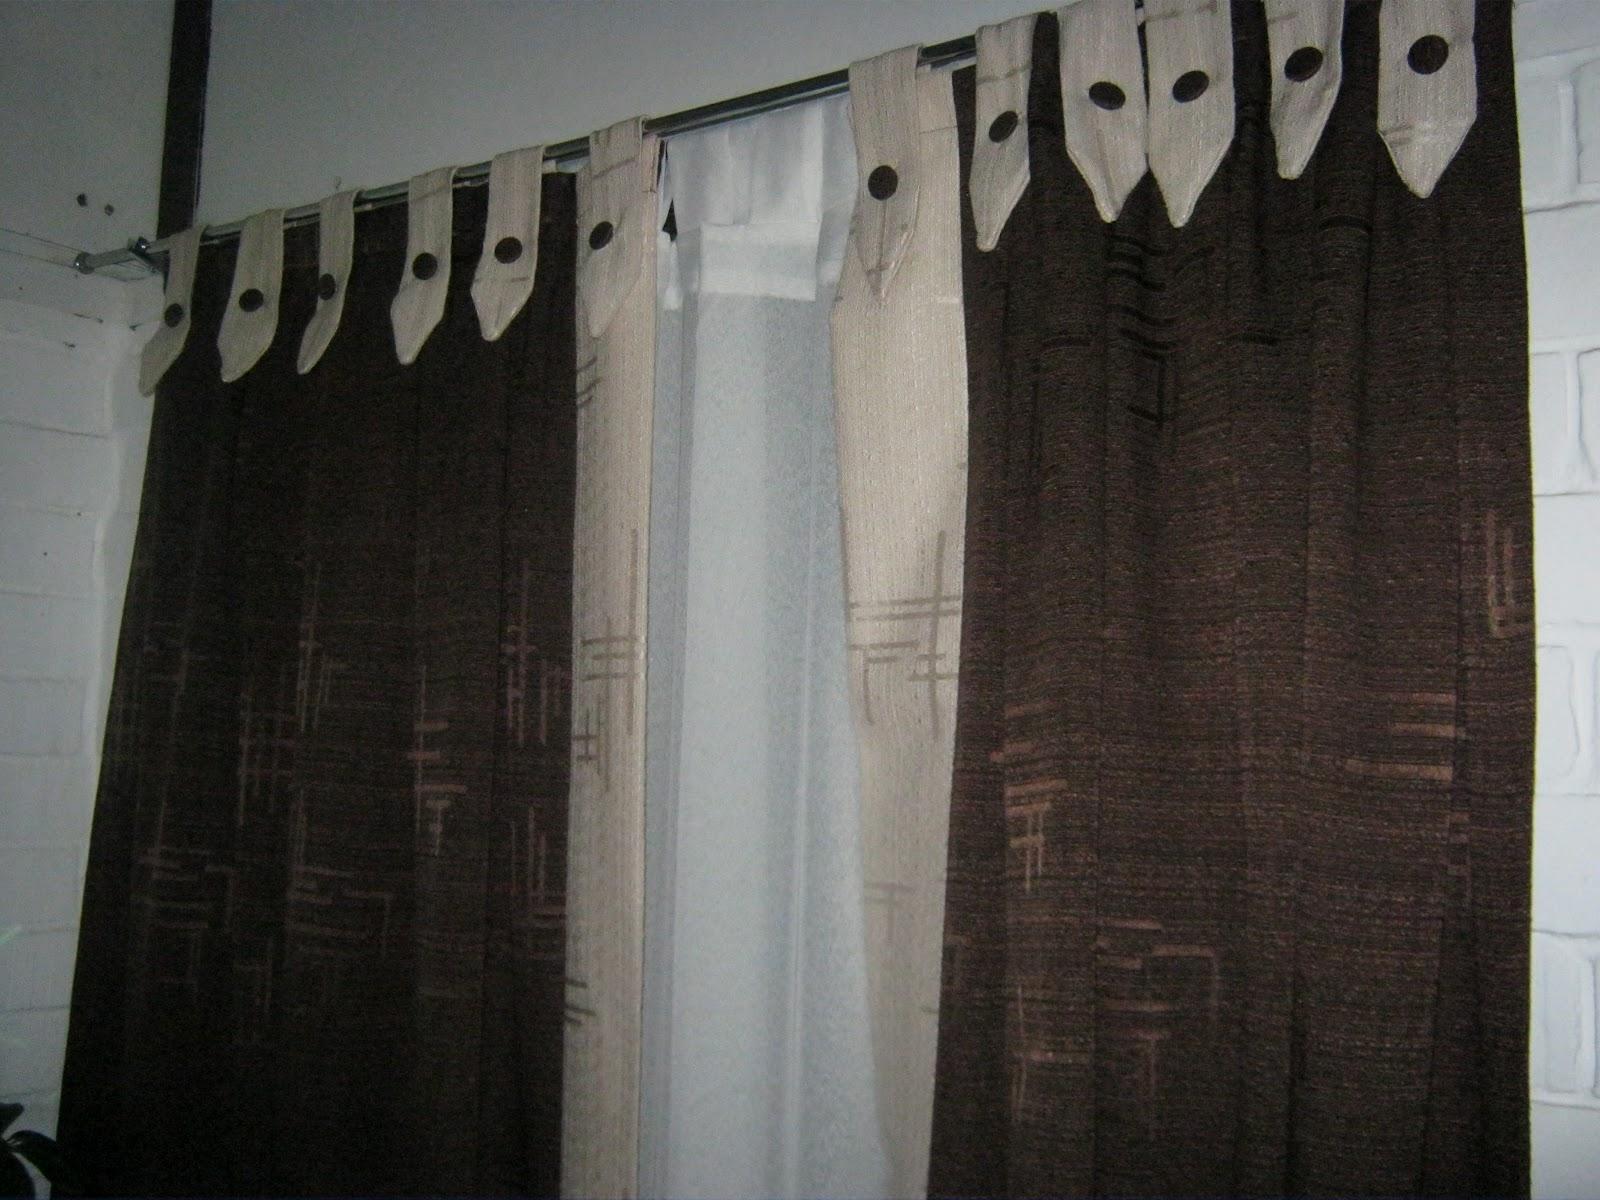 Tus dise os confecciones cortinas de tela for Cortinas de tela para living